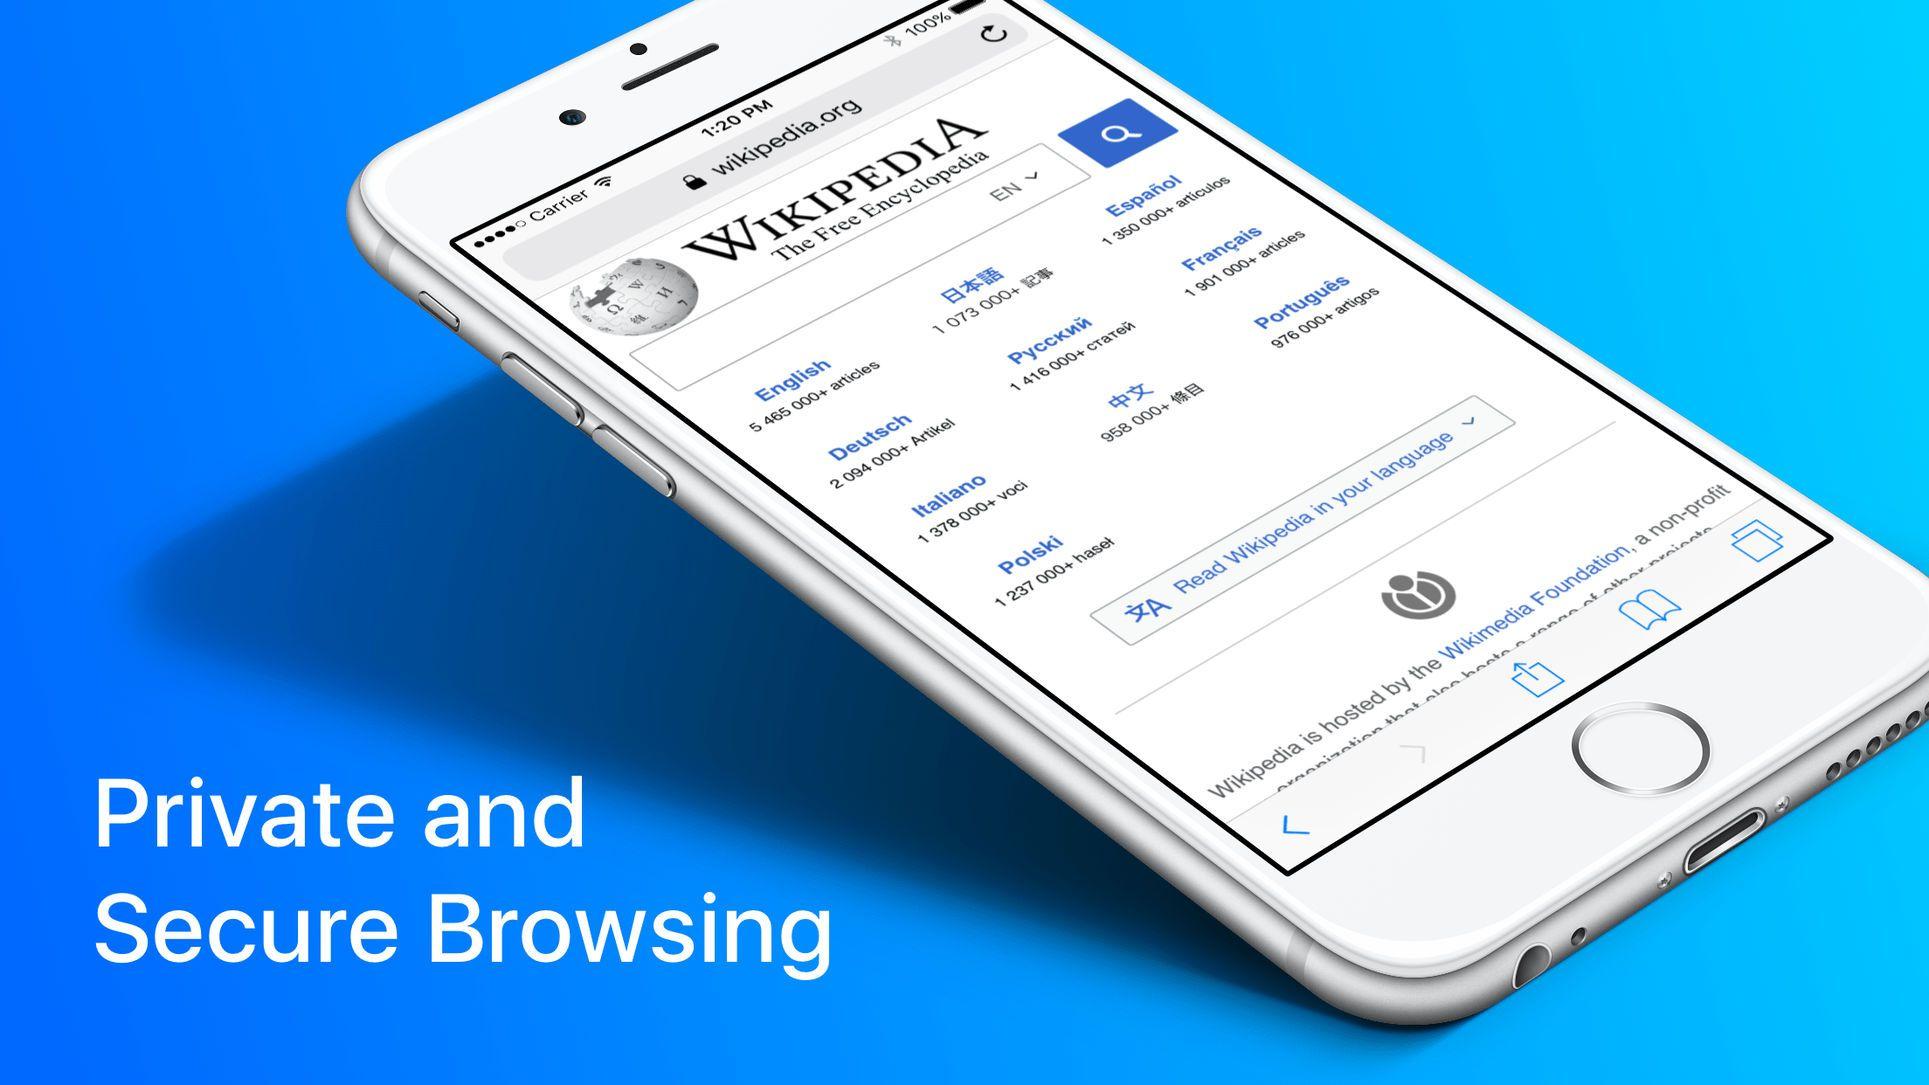 VPN 24 Hotspot VPN for iPhone ProductivityGmbHios